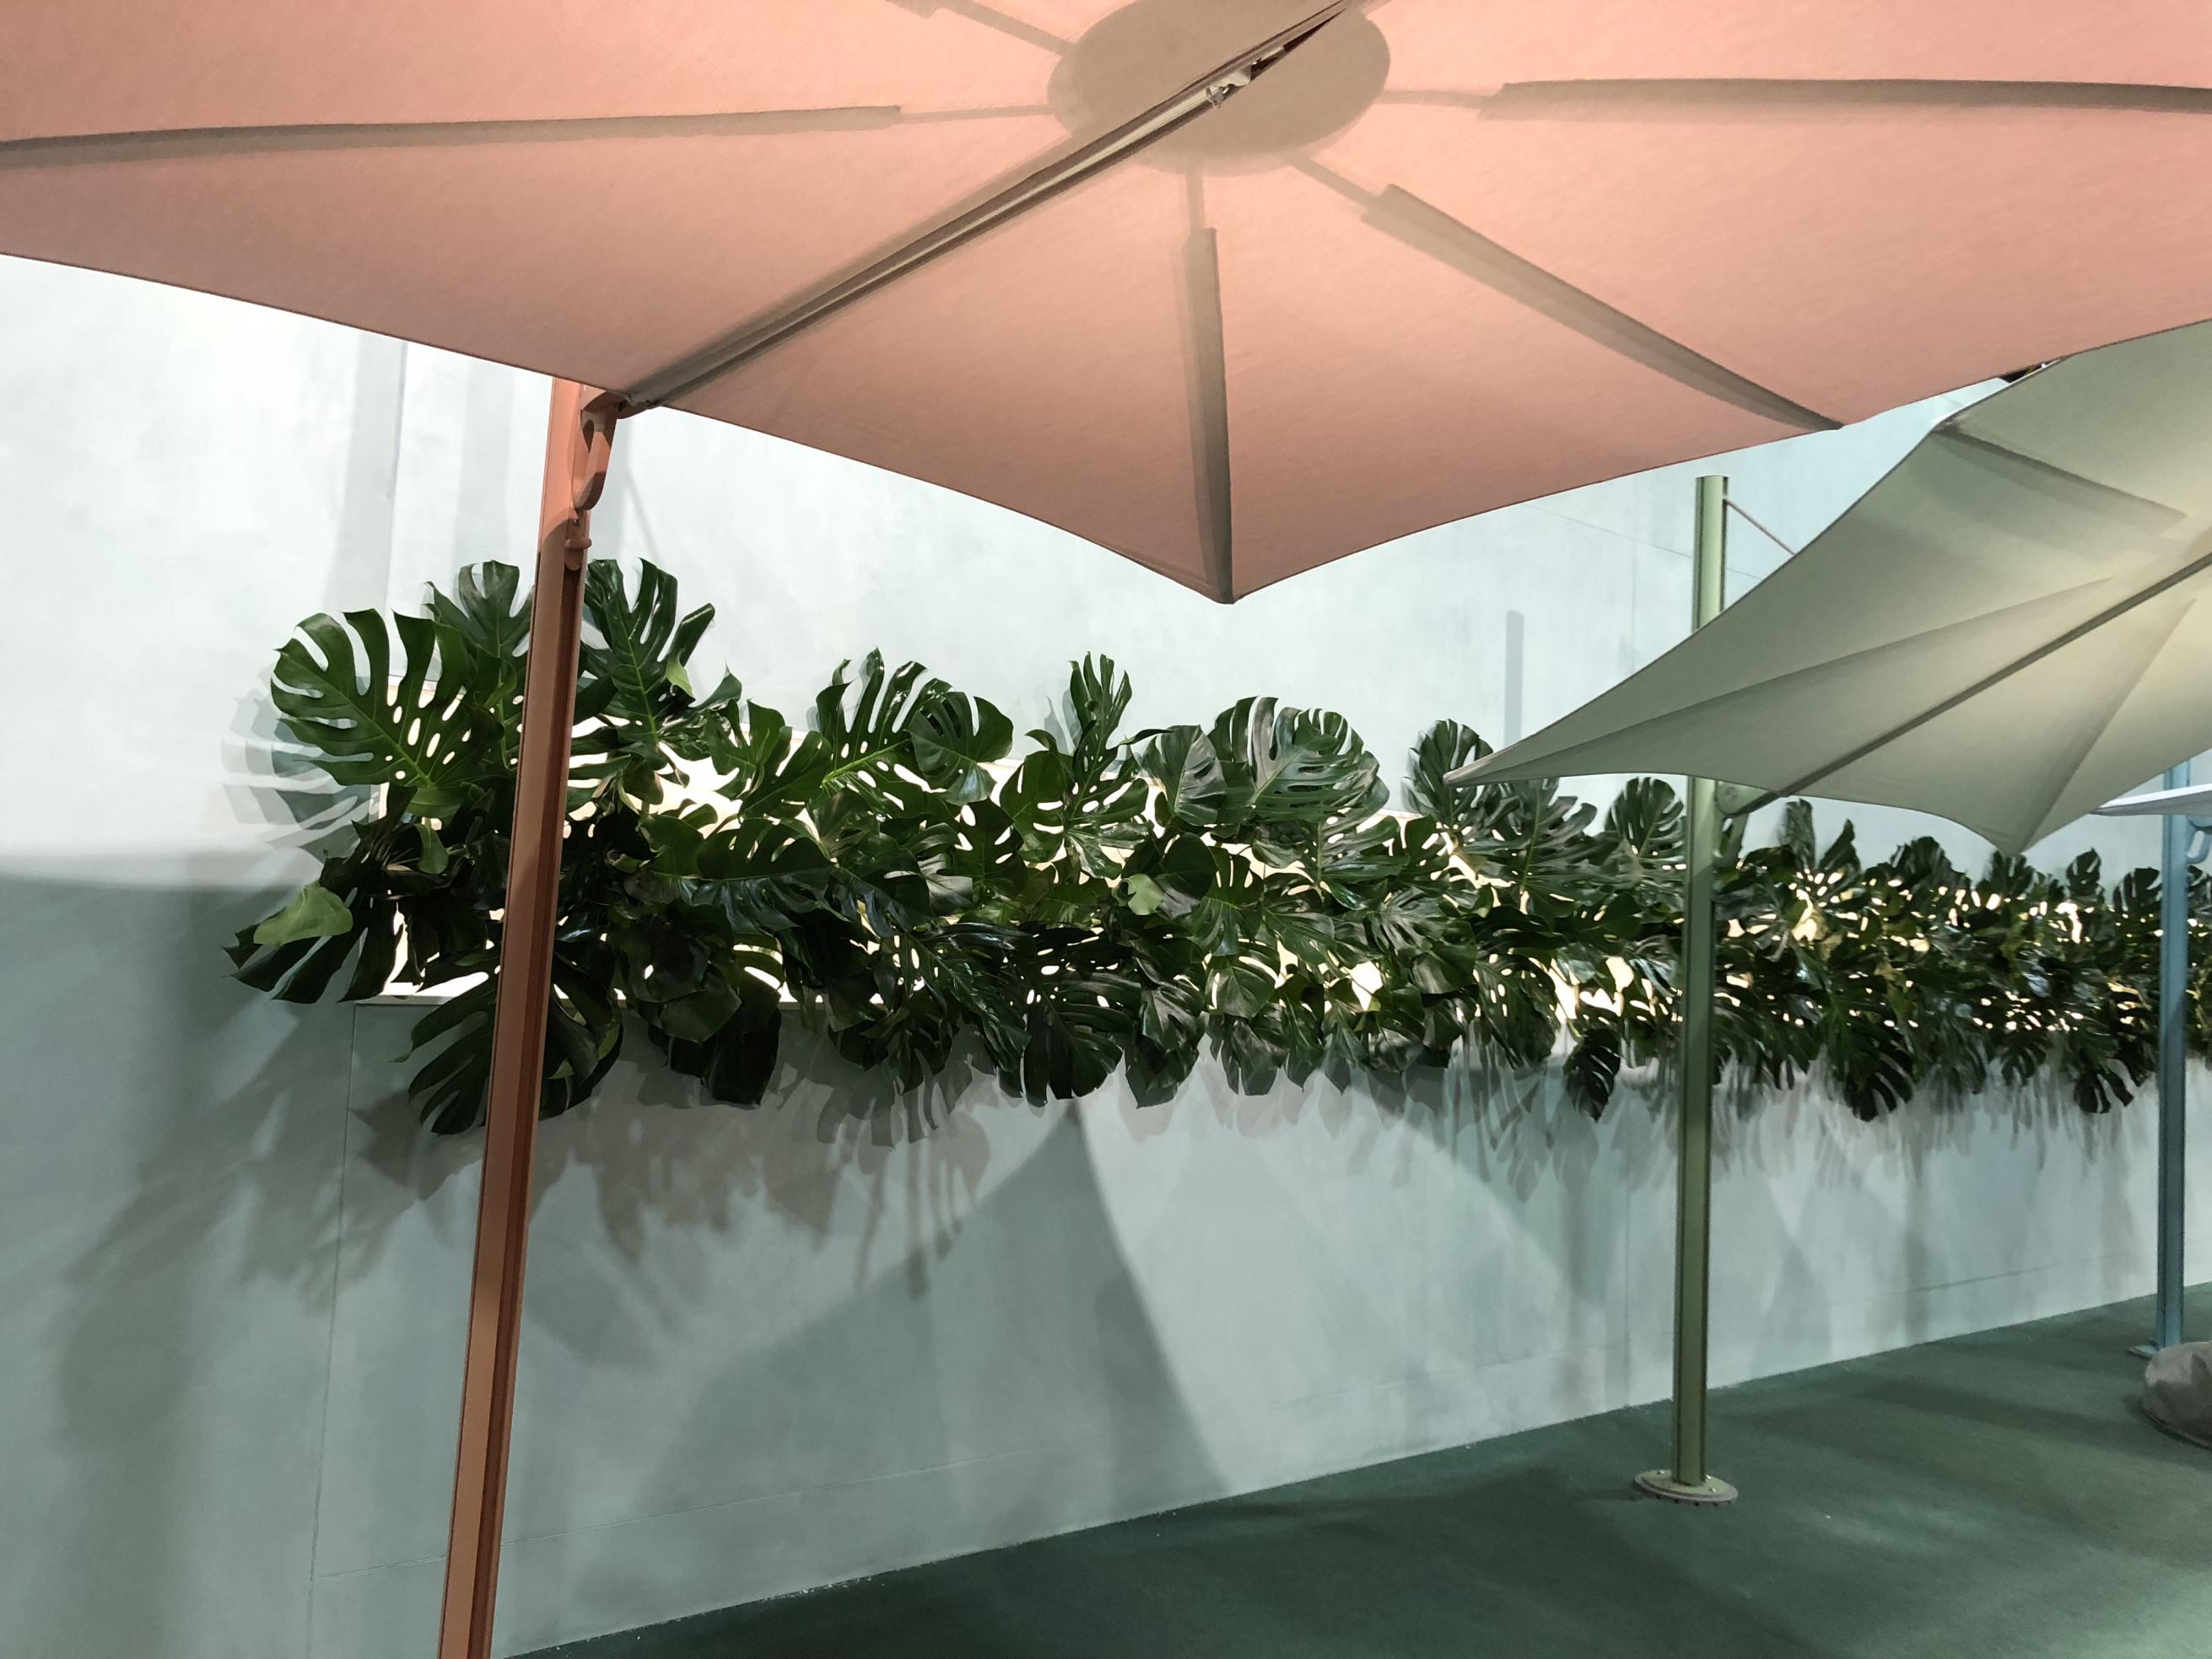 Umbrosa parasols Interieur23.jpg